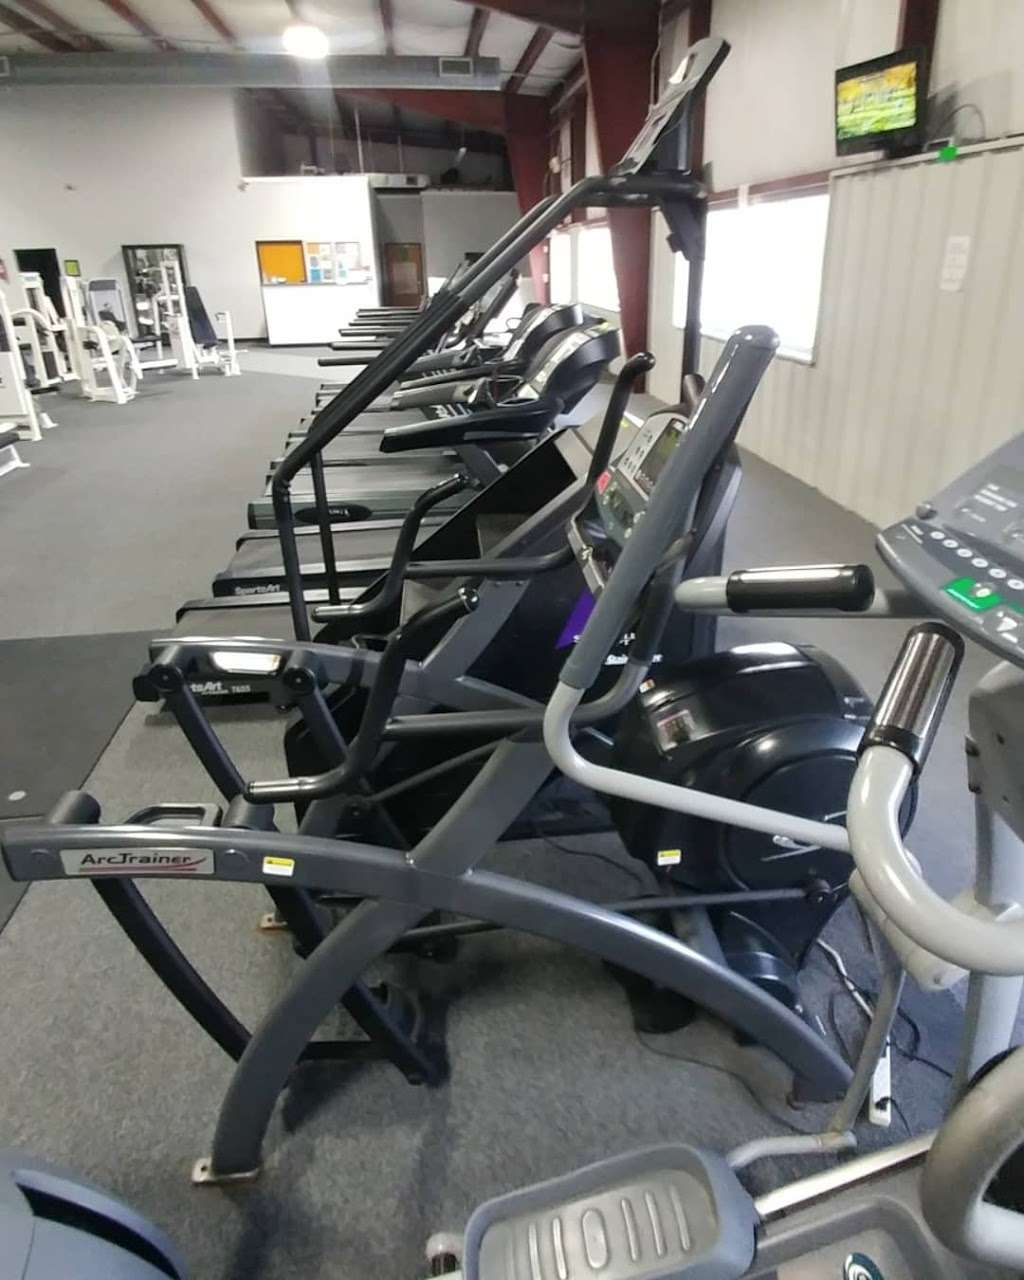 Ultimate Image Fitness Center - health  | Photo 4 of 7 | Address: 300 Spring Cir, Odessa, MO 64076, USA | Phone: (816) 633-8348